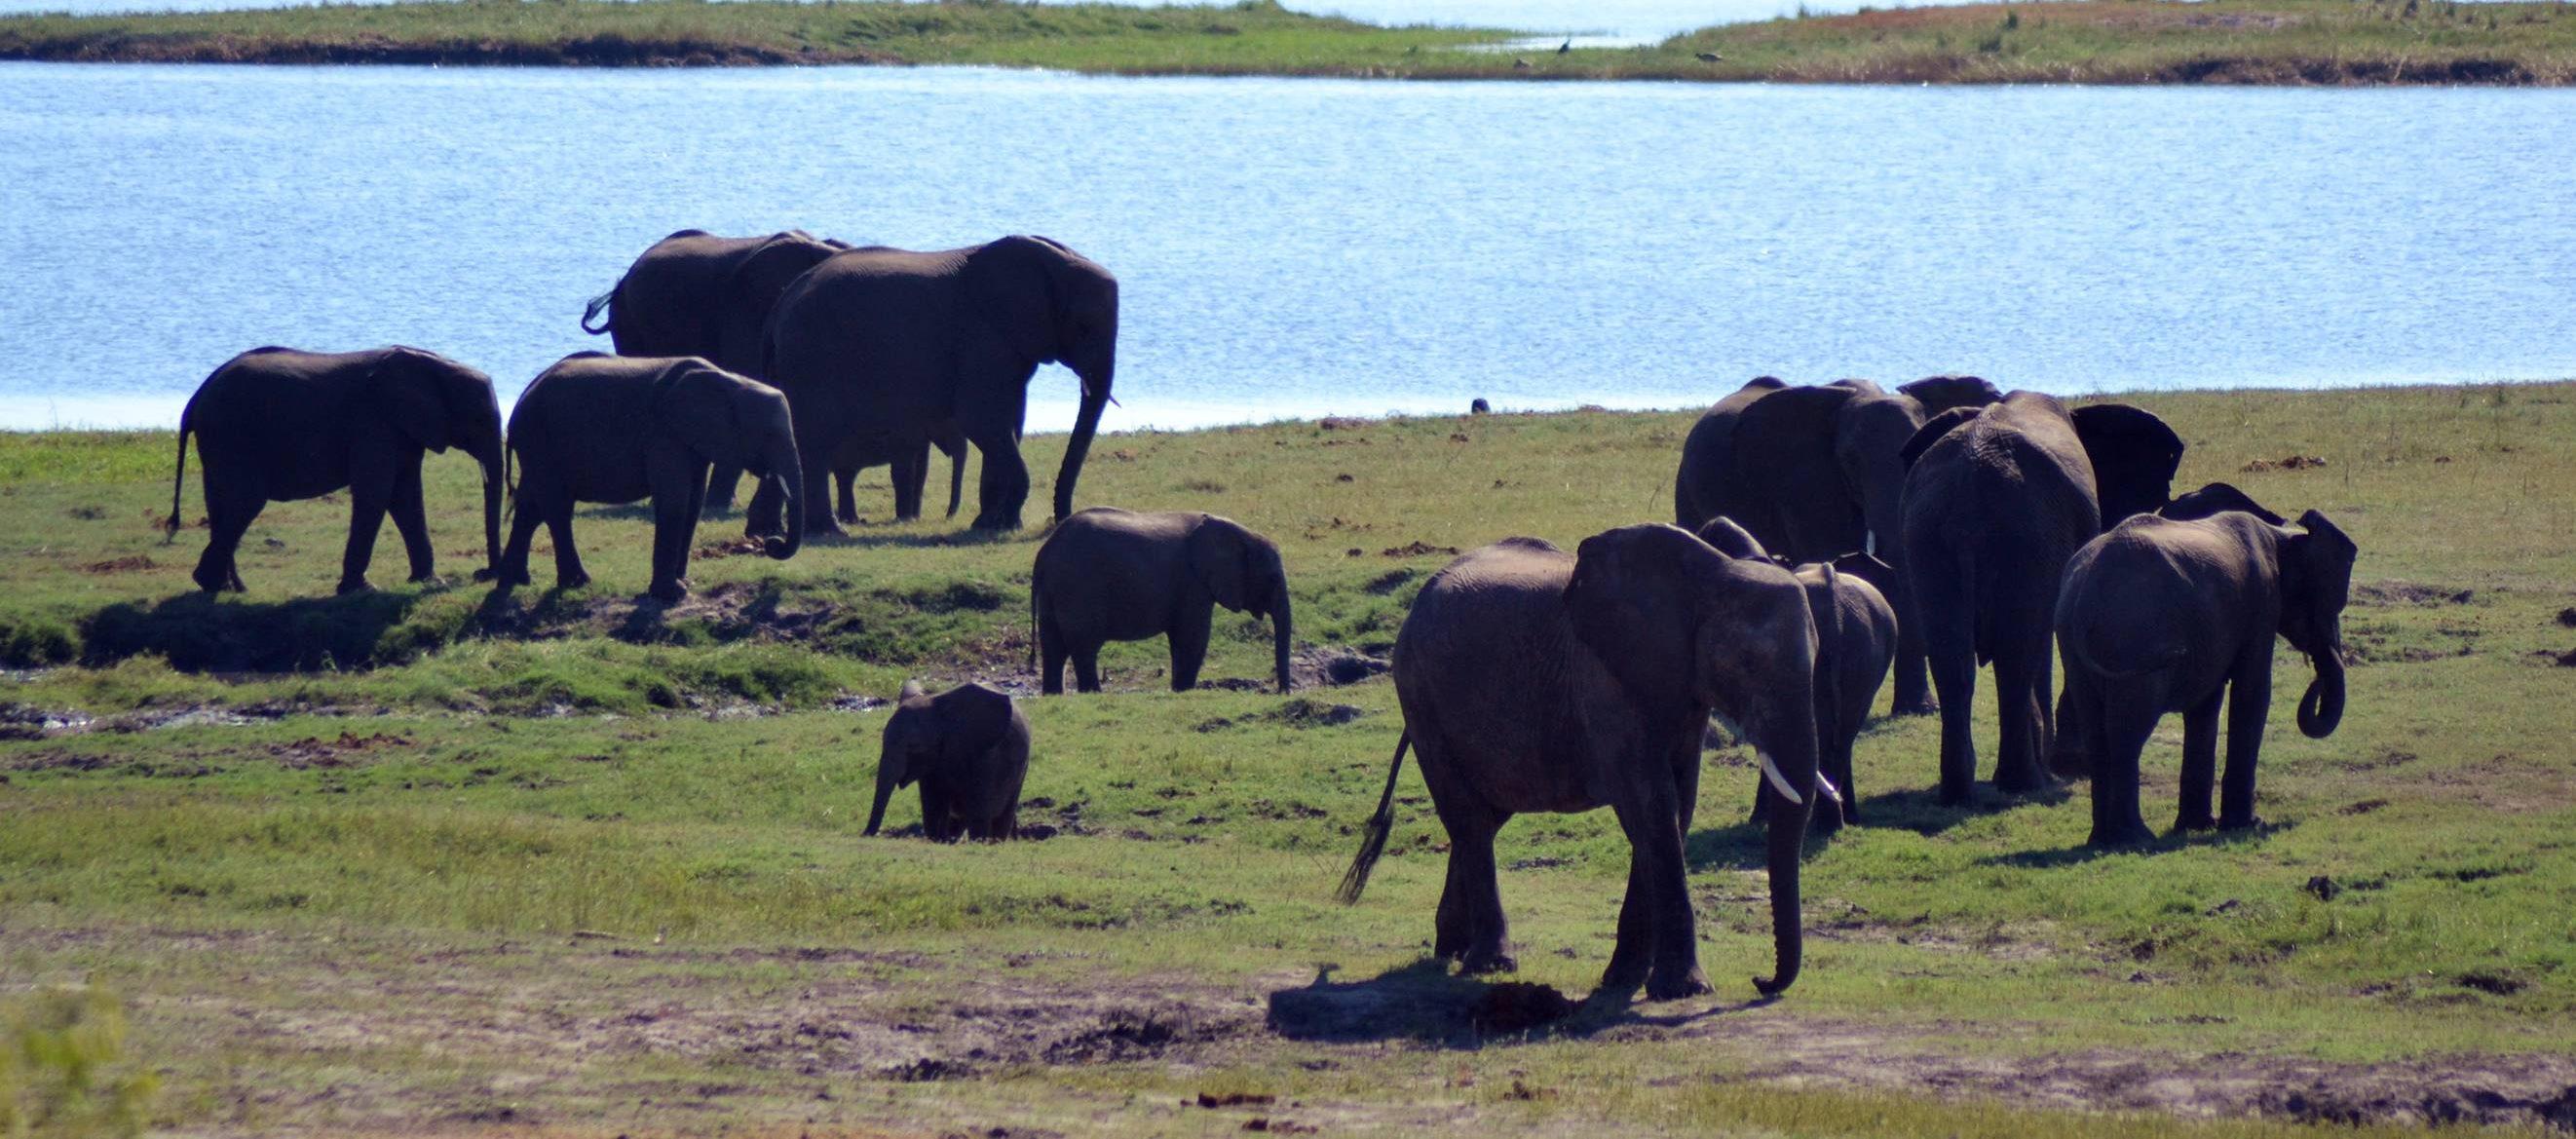 chobe_botswana_elefante_4_edited